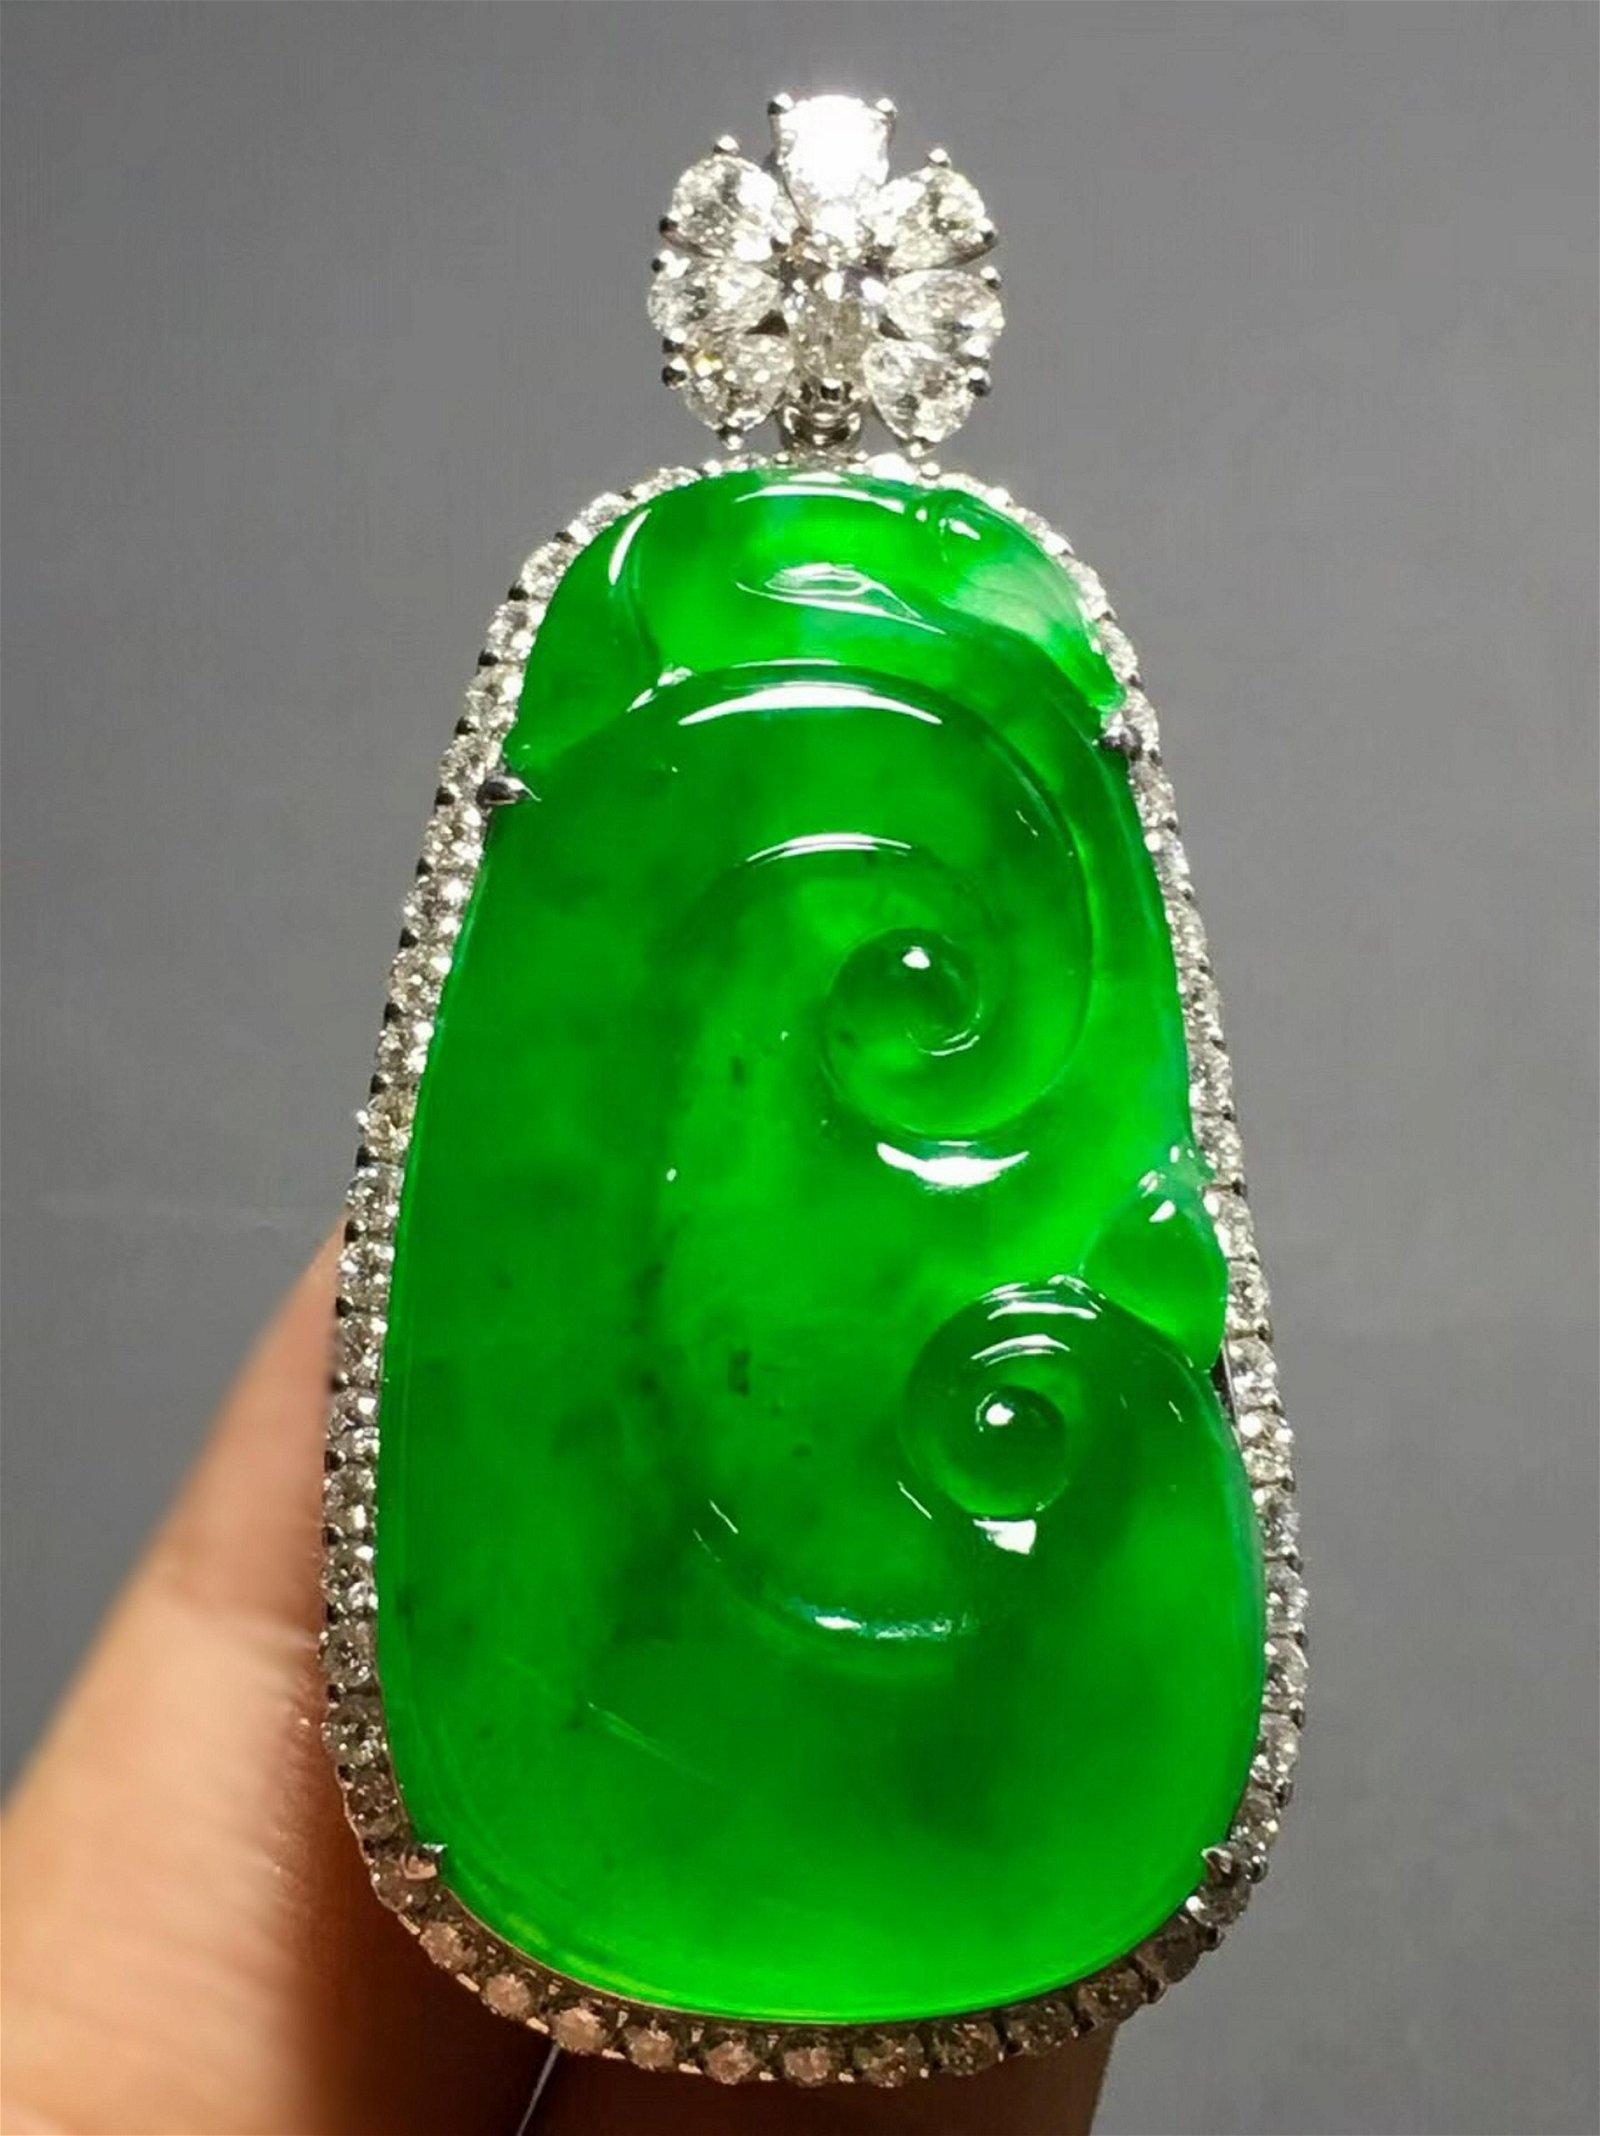 A GREEN JADEITE 'RUYI' SHAPED PENDANT